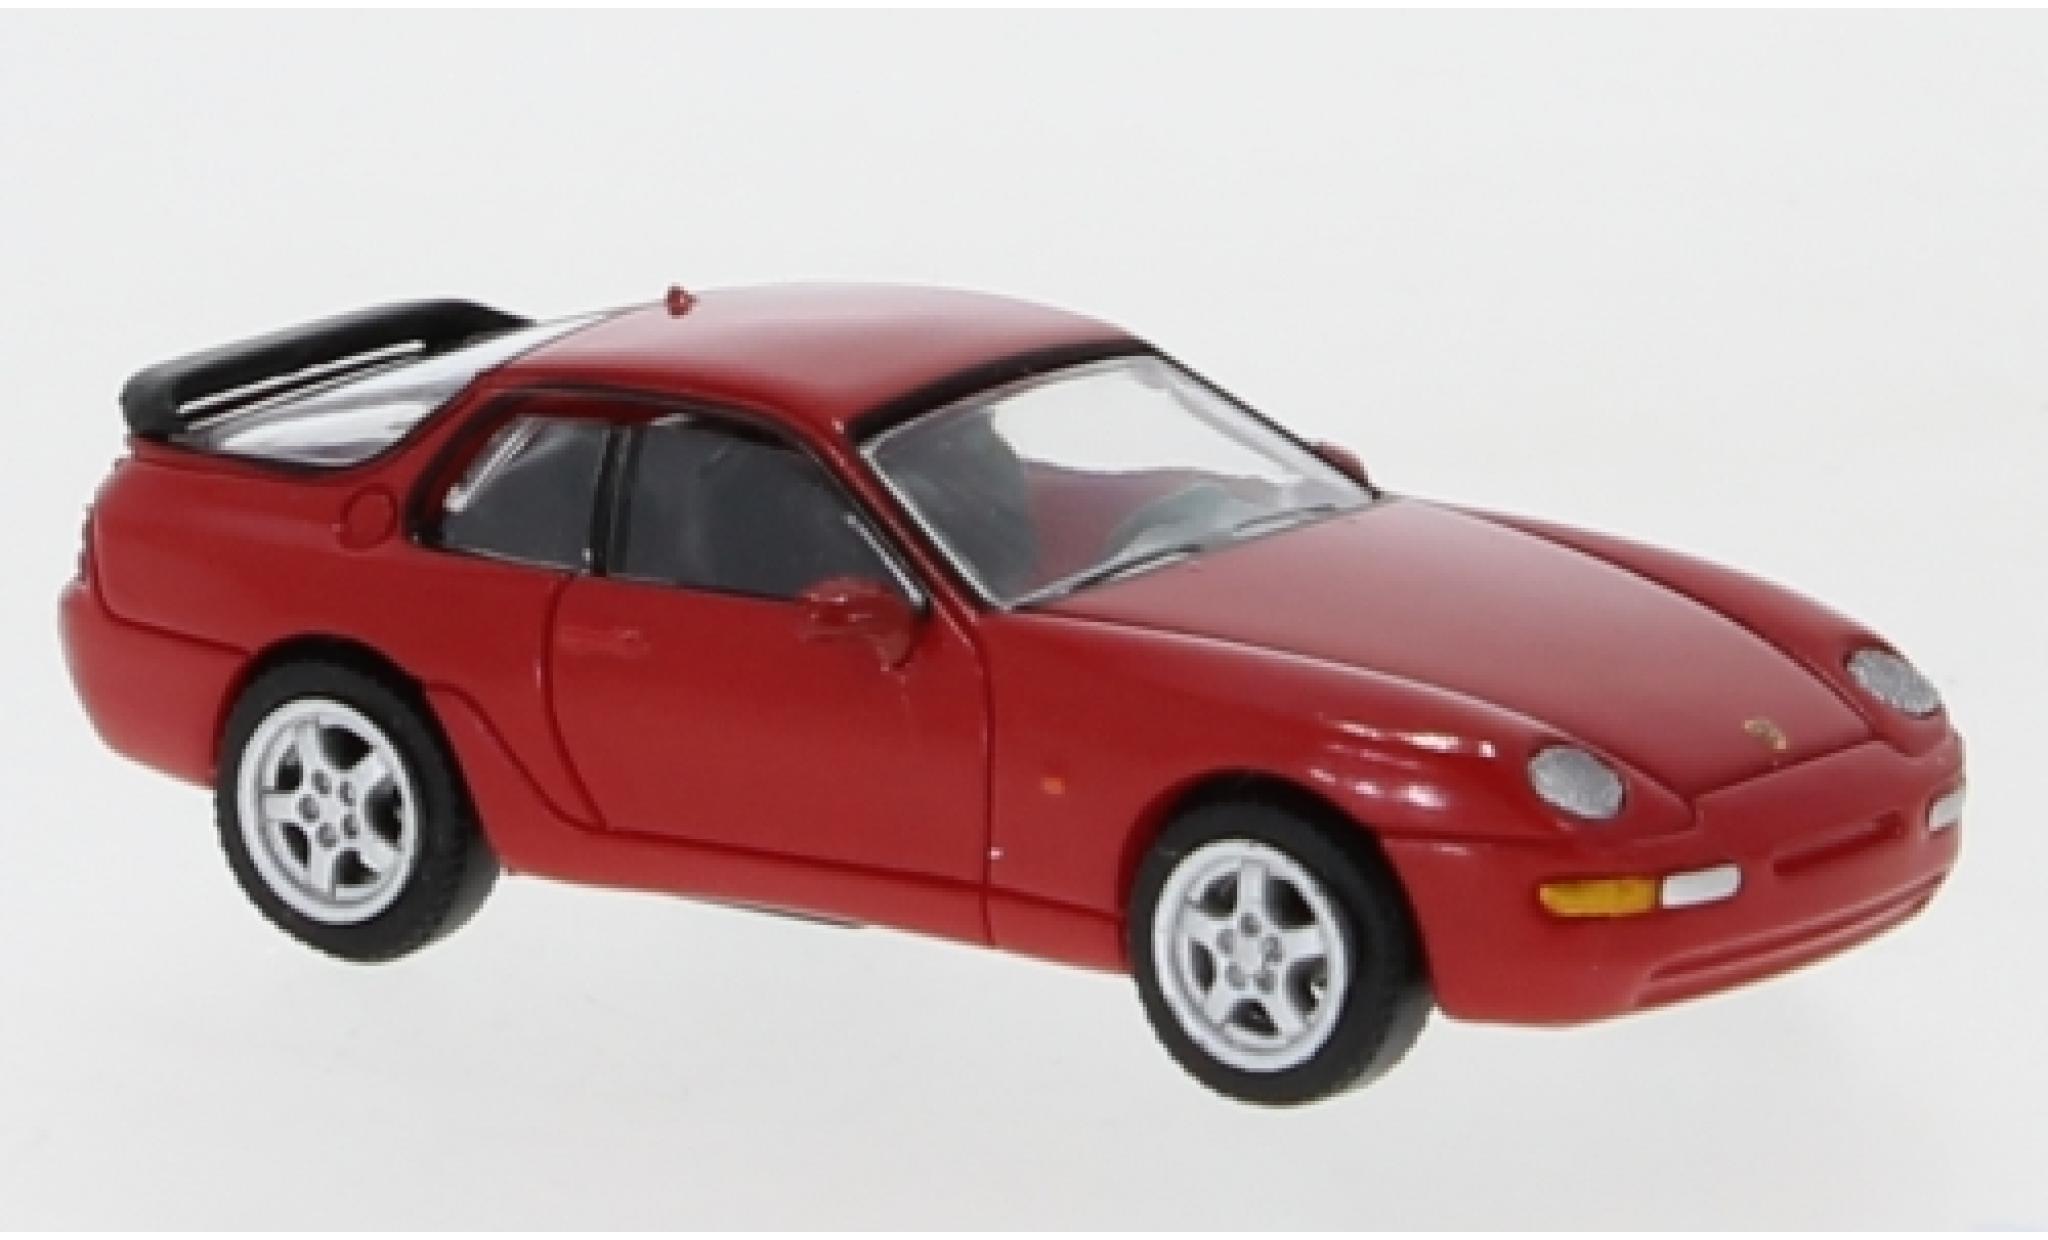 Porsche 968 1/87 Premium ClassiXXs rouge 1991